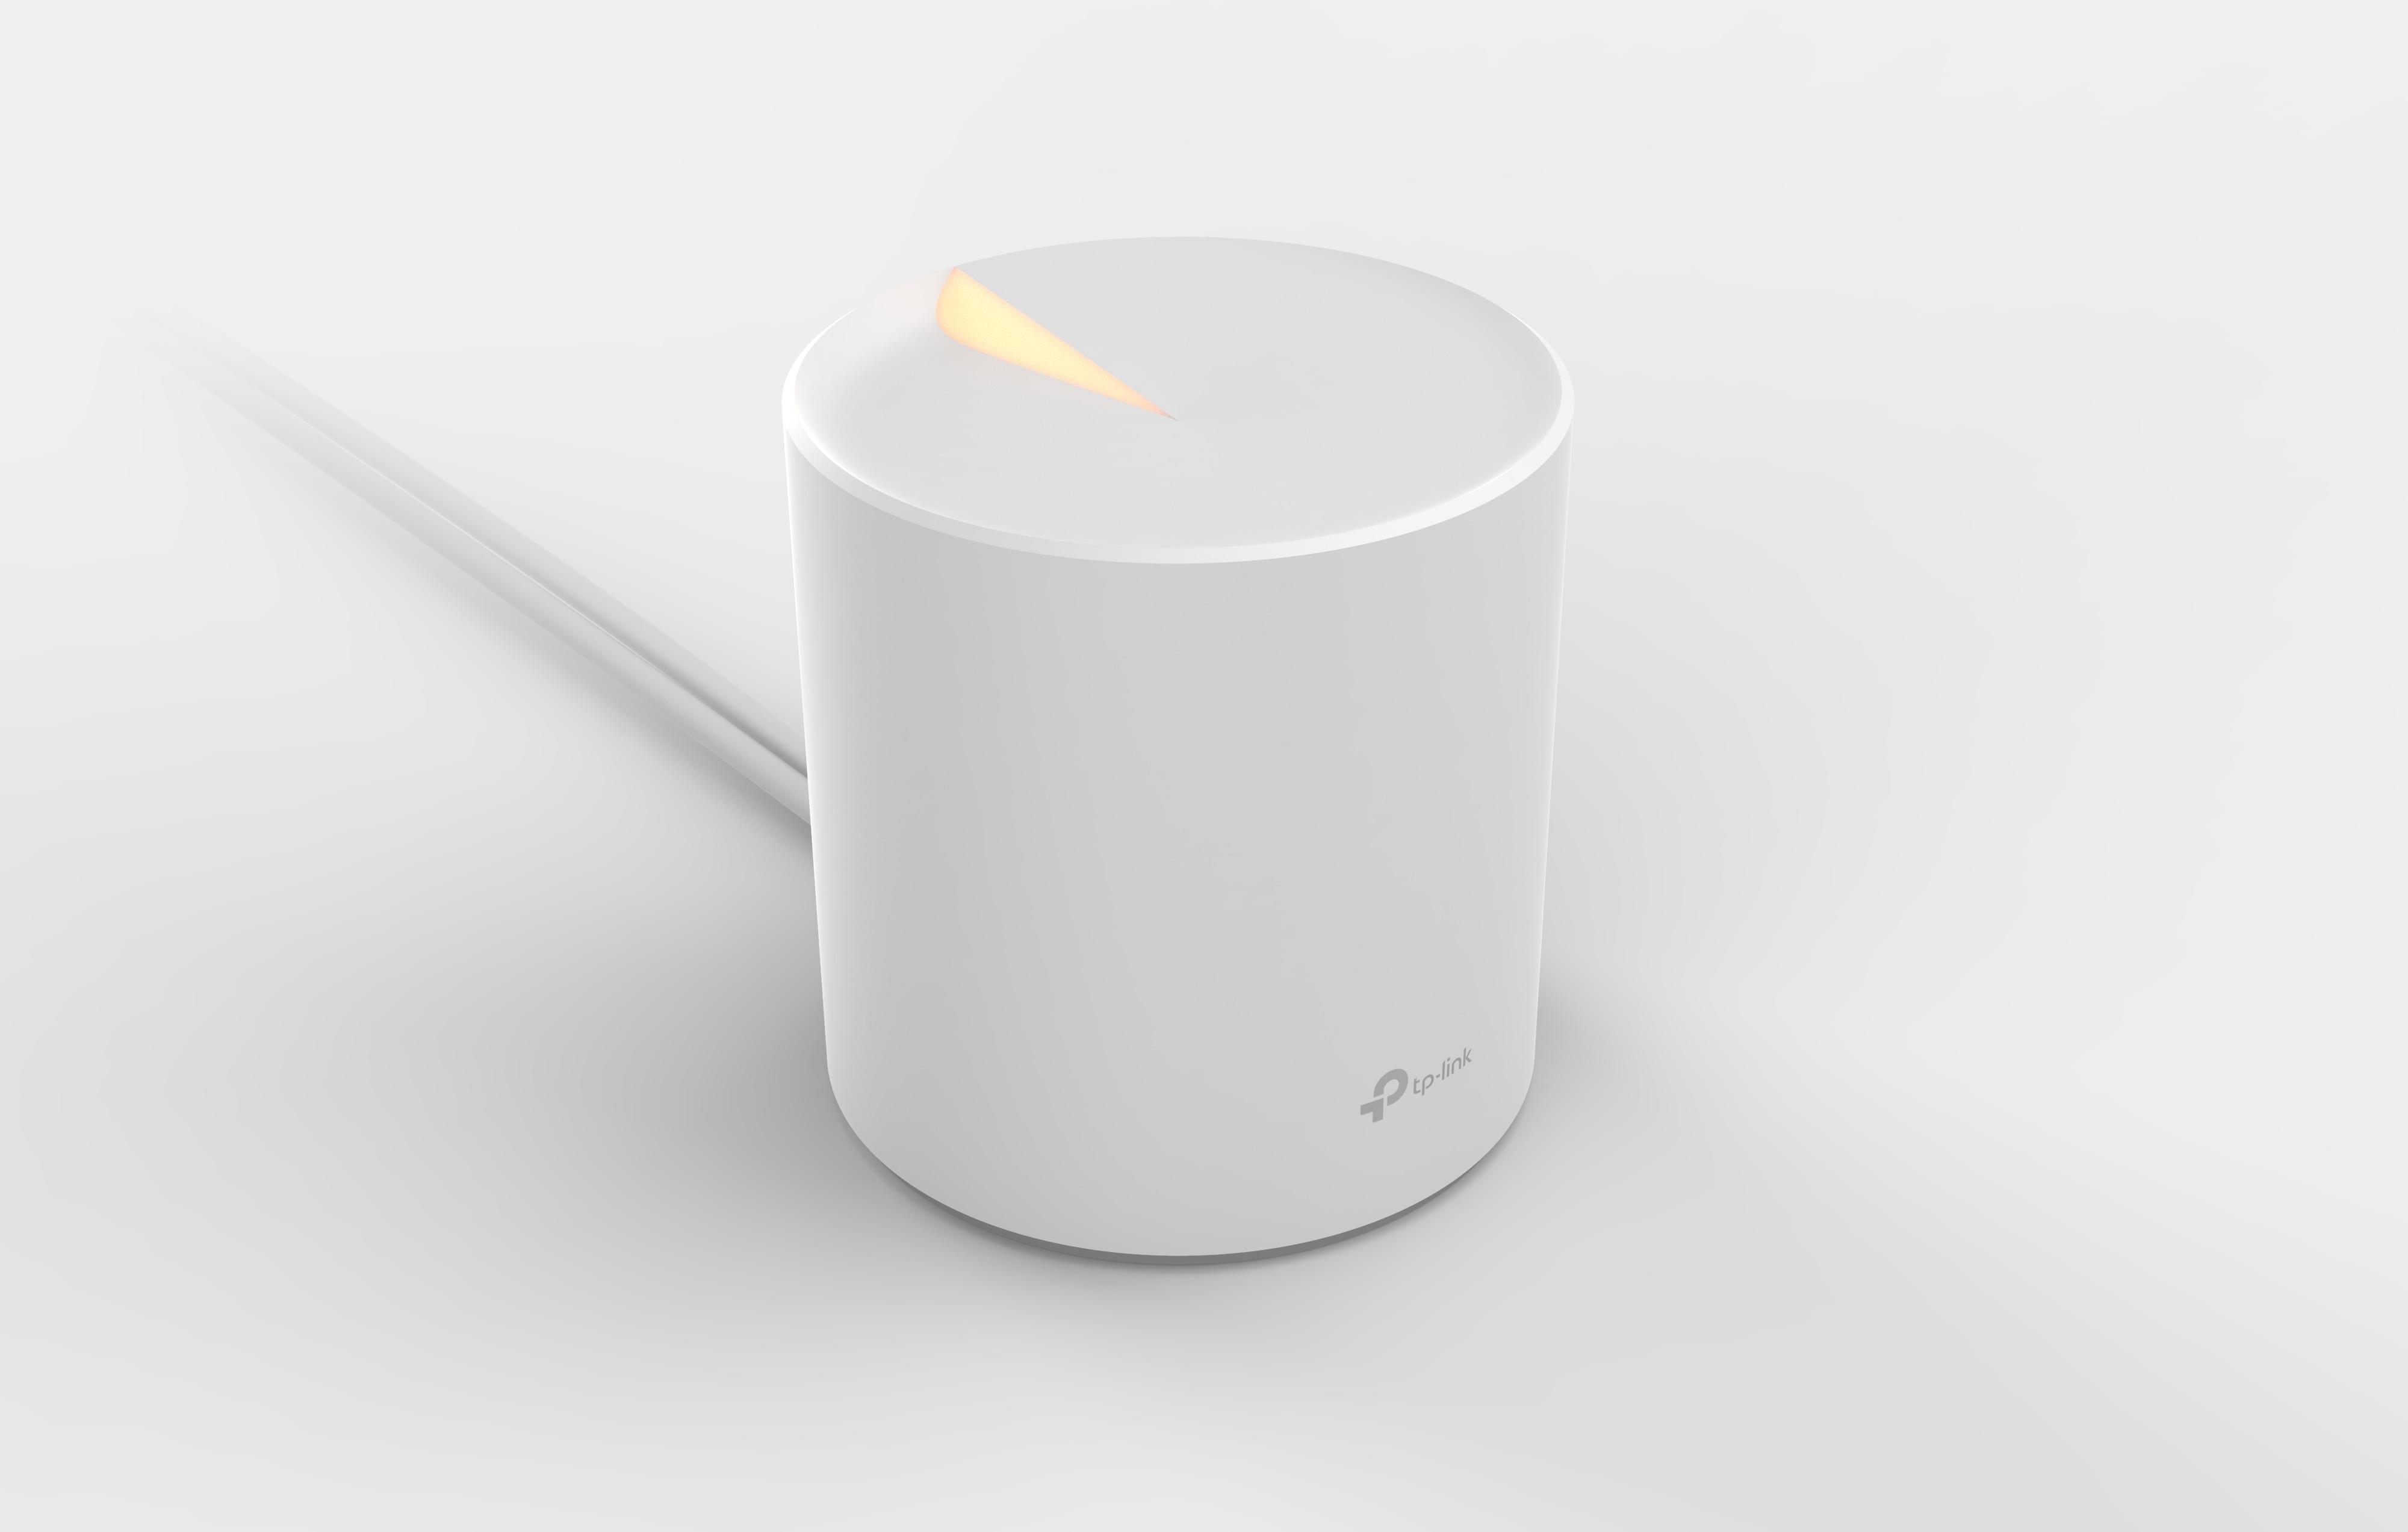 Deco X10 – AX Mesh WiFi